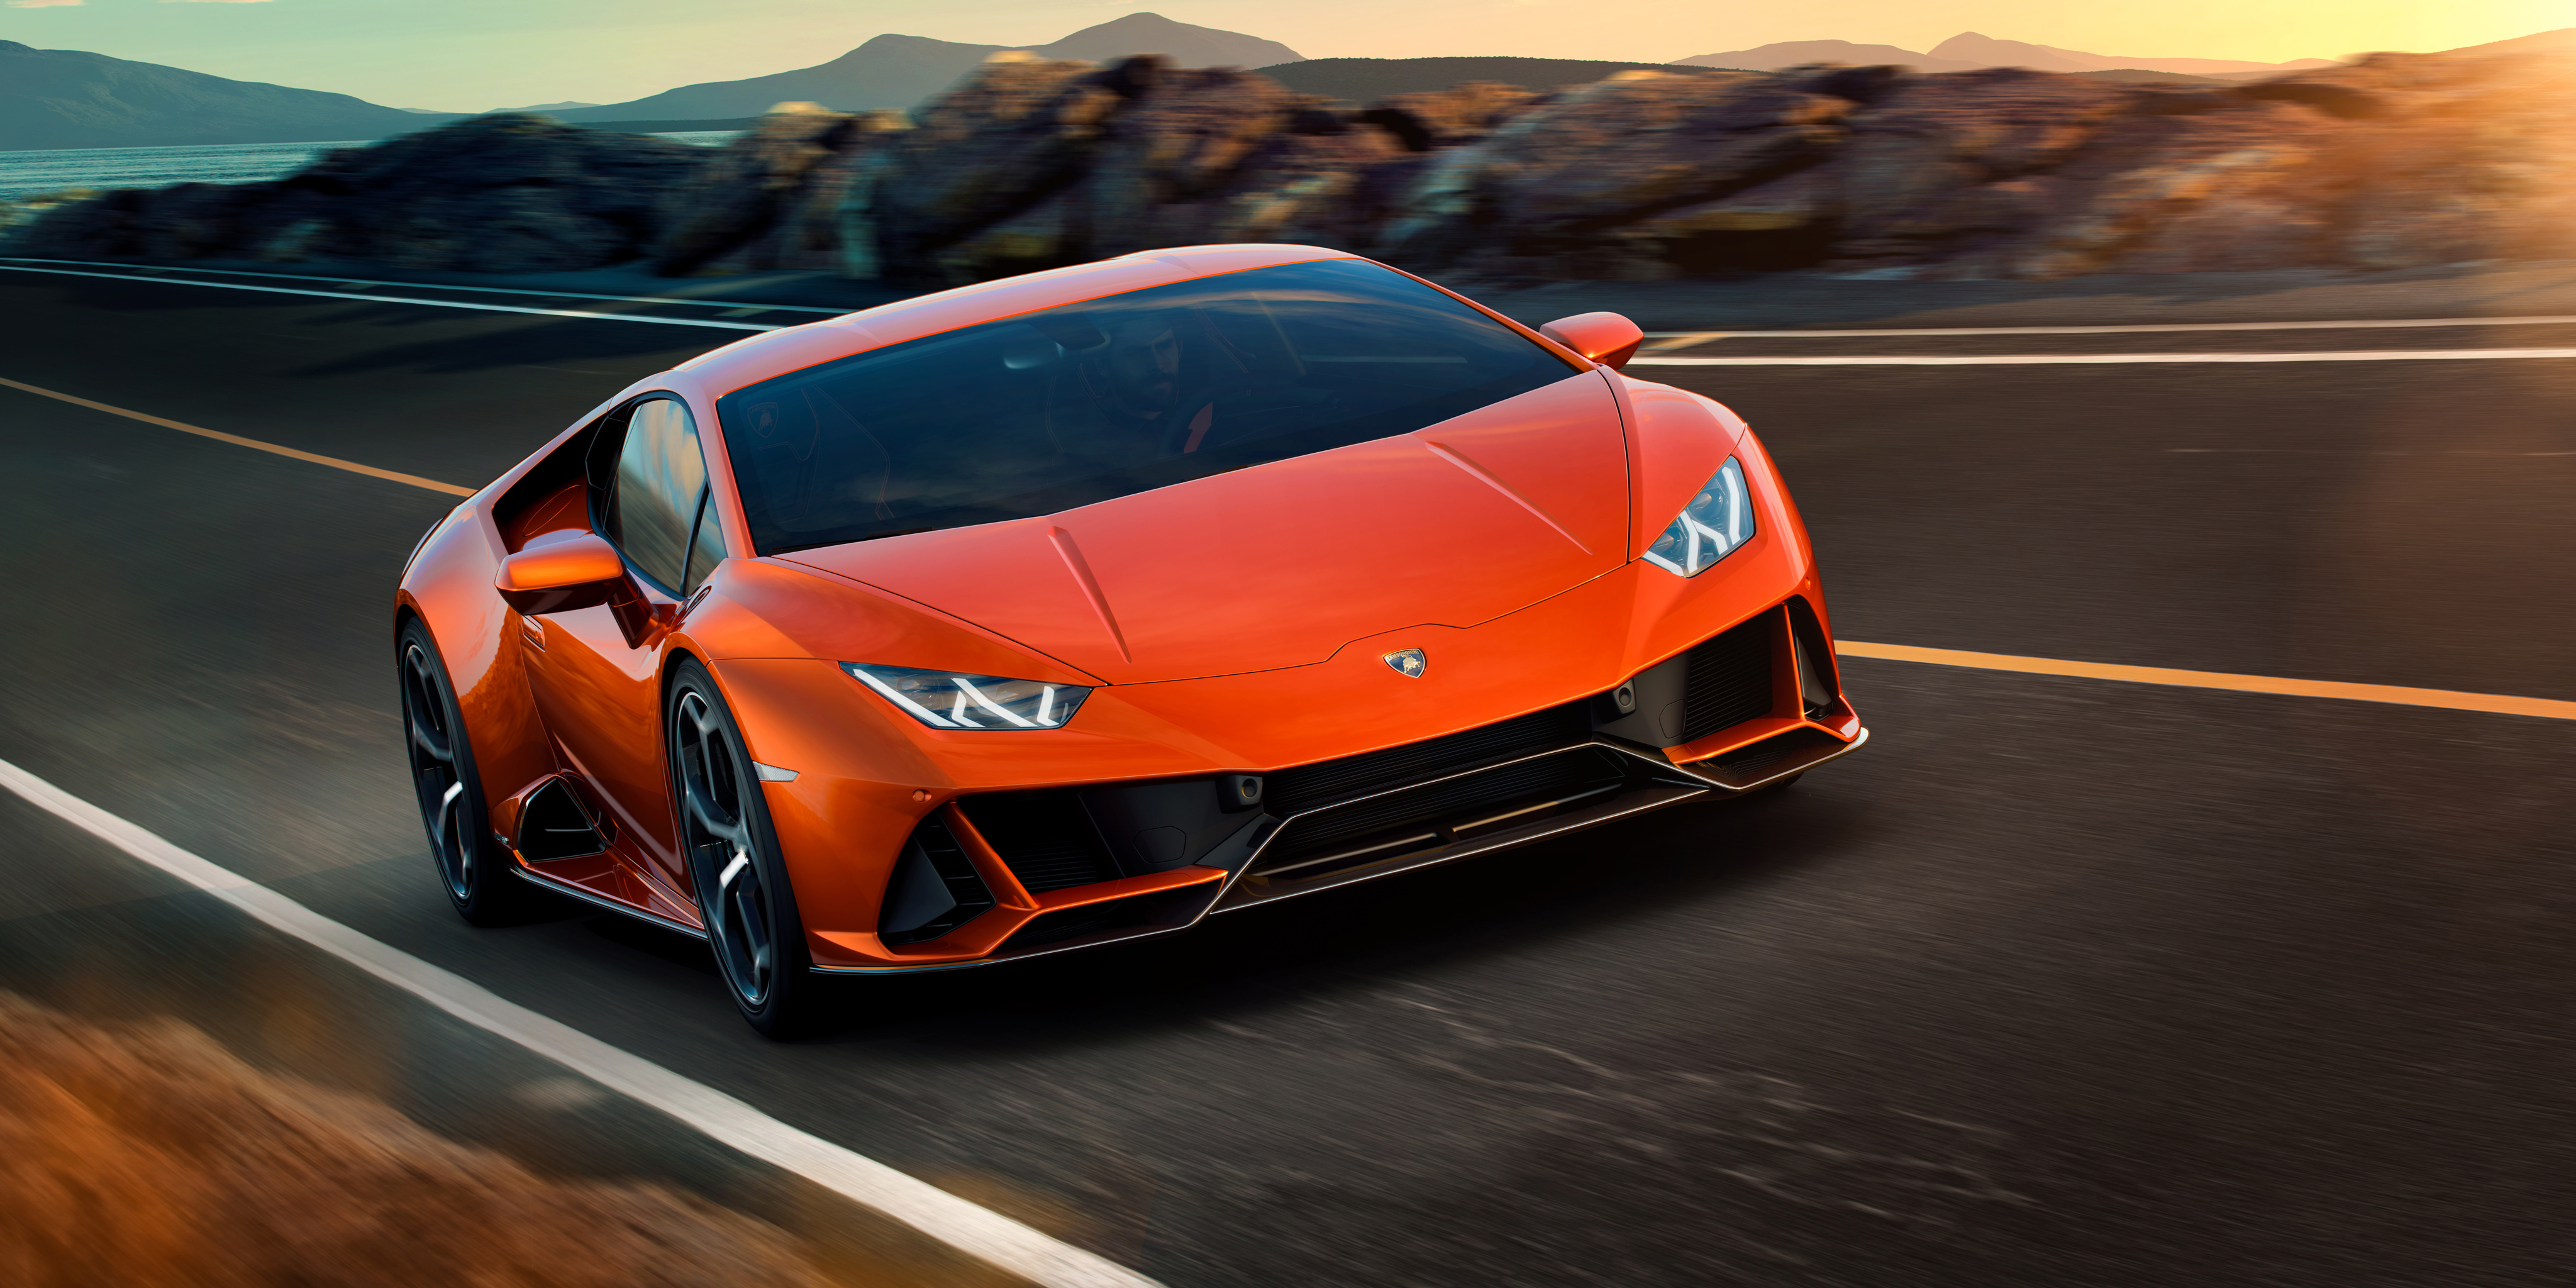 Lamborghini Huracan Evo 2019 4k Hd Cars 4k Wallpapers